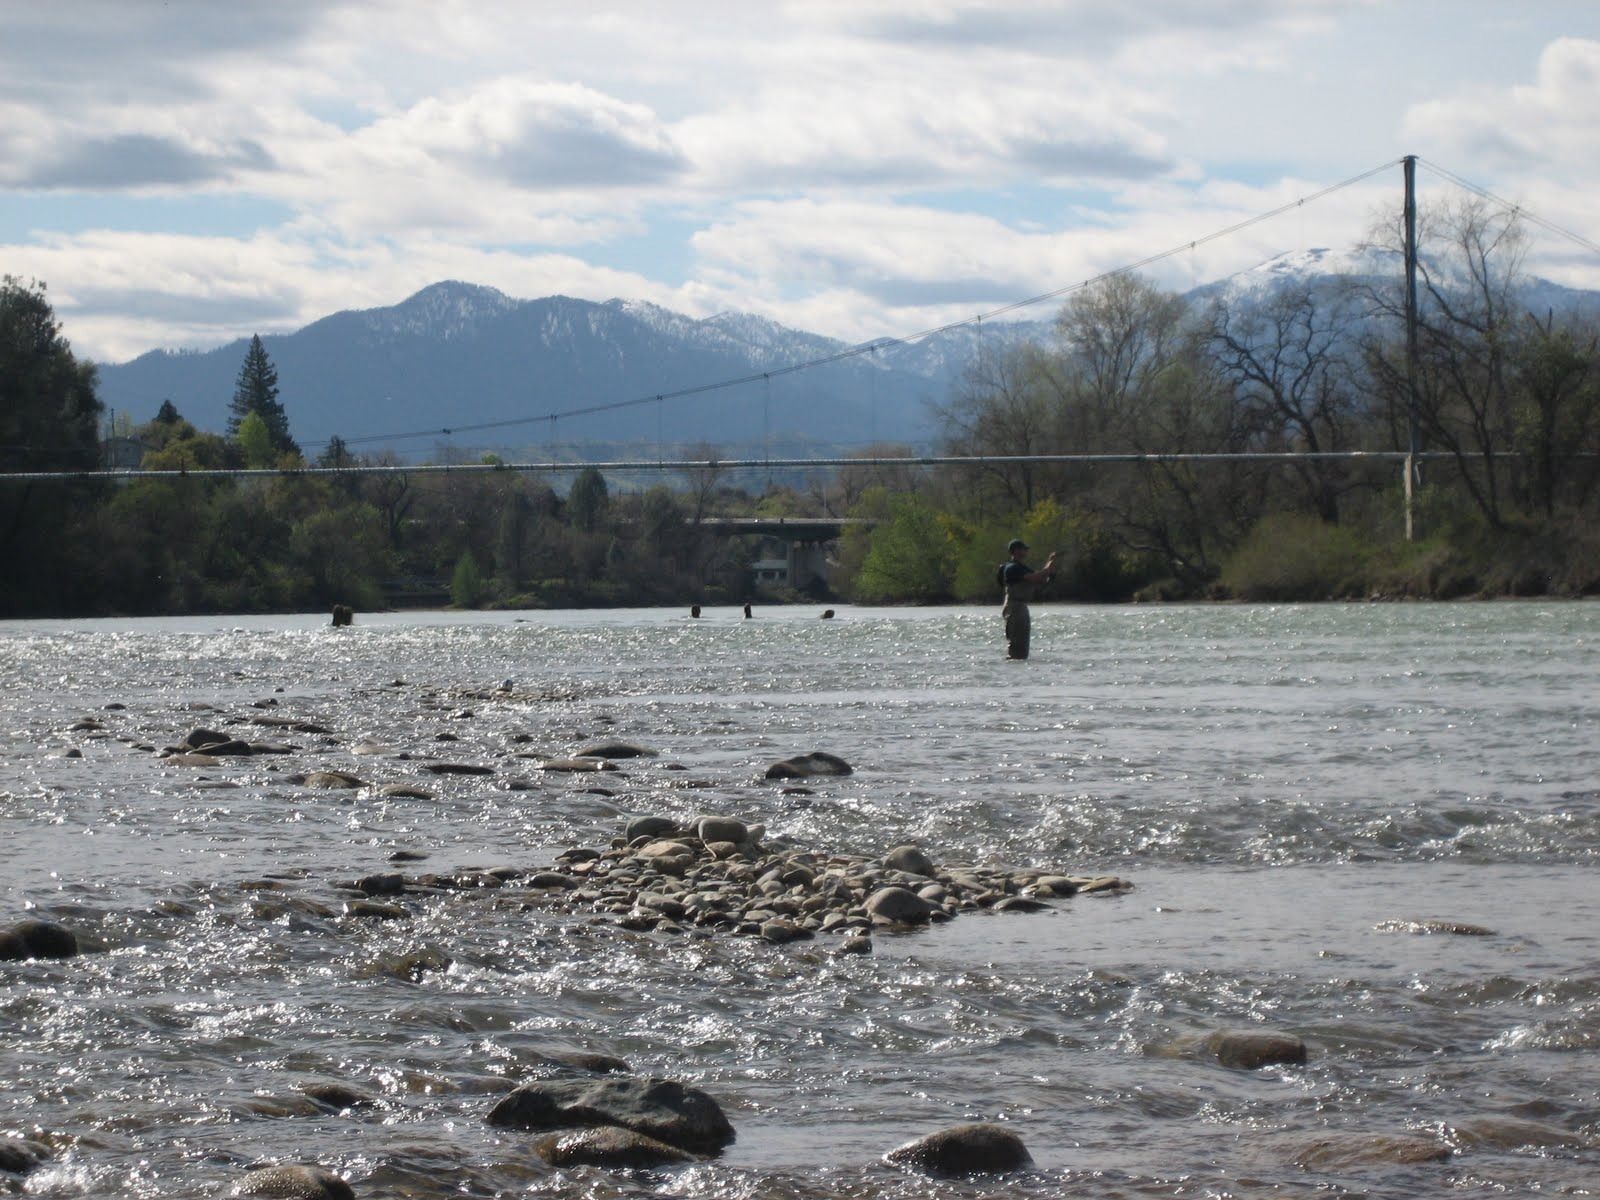 Fin 39 n feather favorite fishing spots lower sac redding for Sacramento river fishing spots